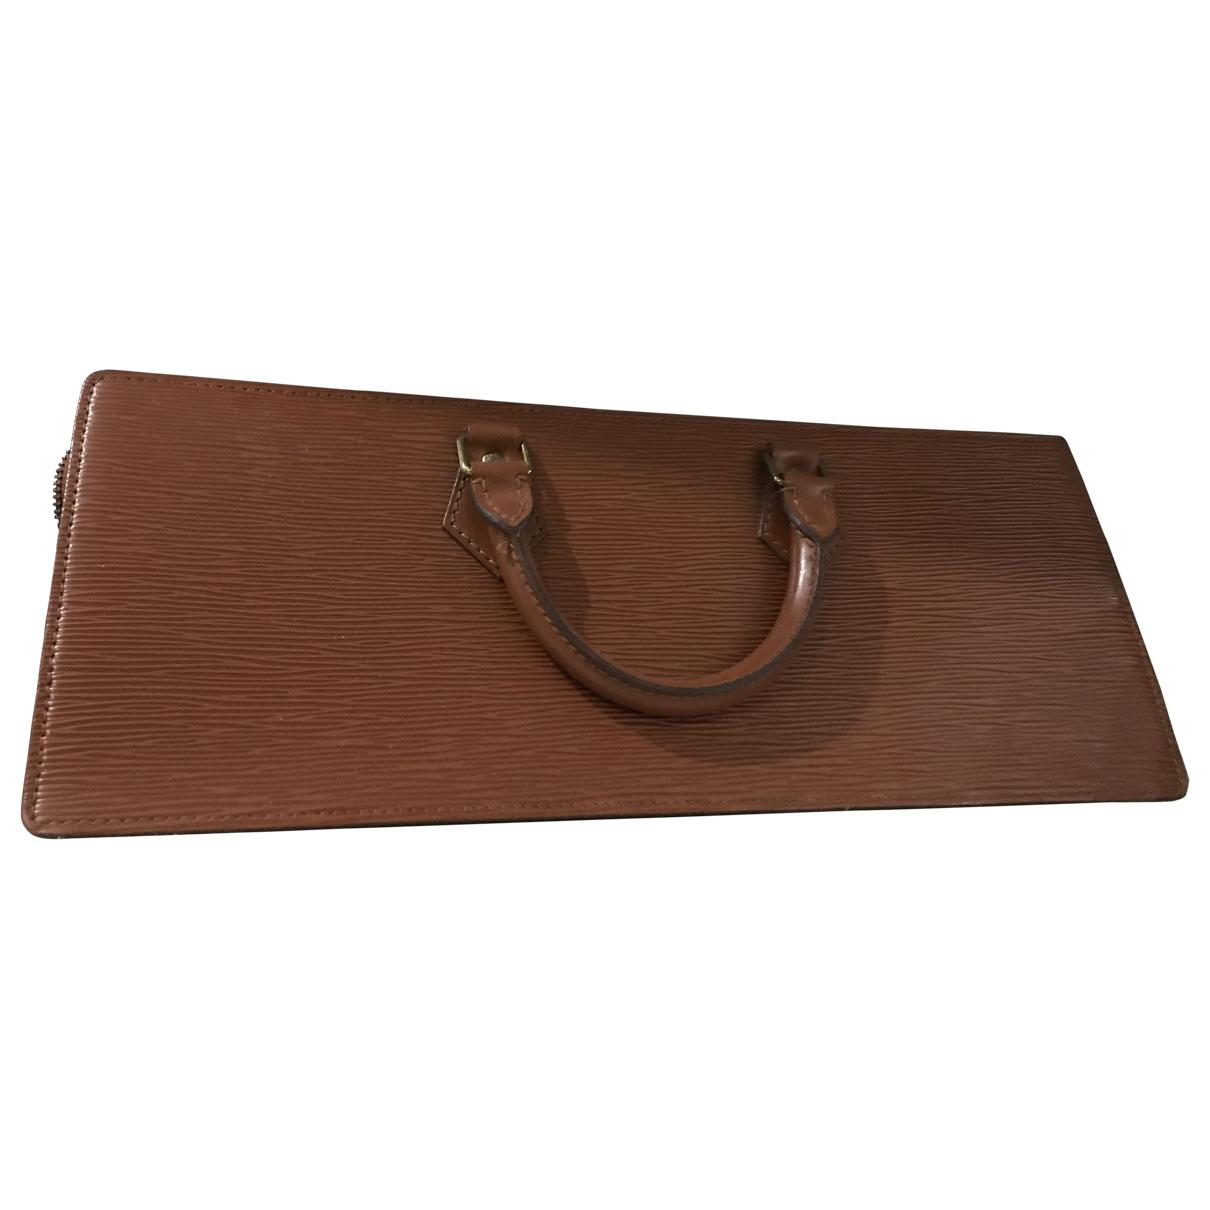 Louis Vuitton - Sac a main Triangle pour femme en cuir - marron